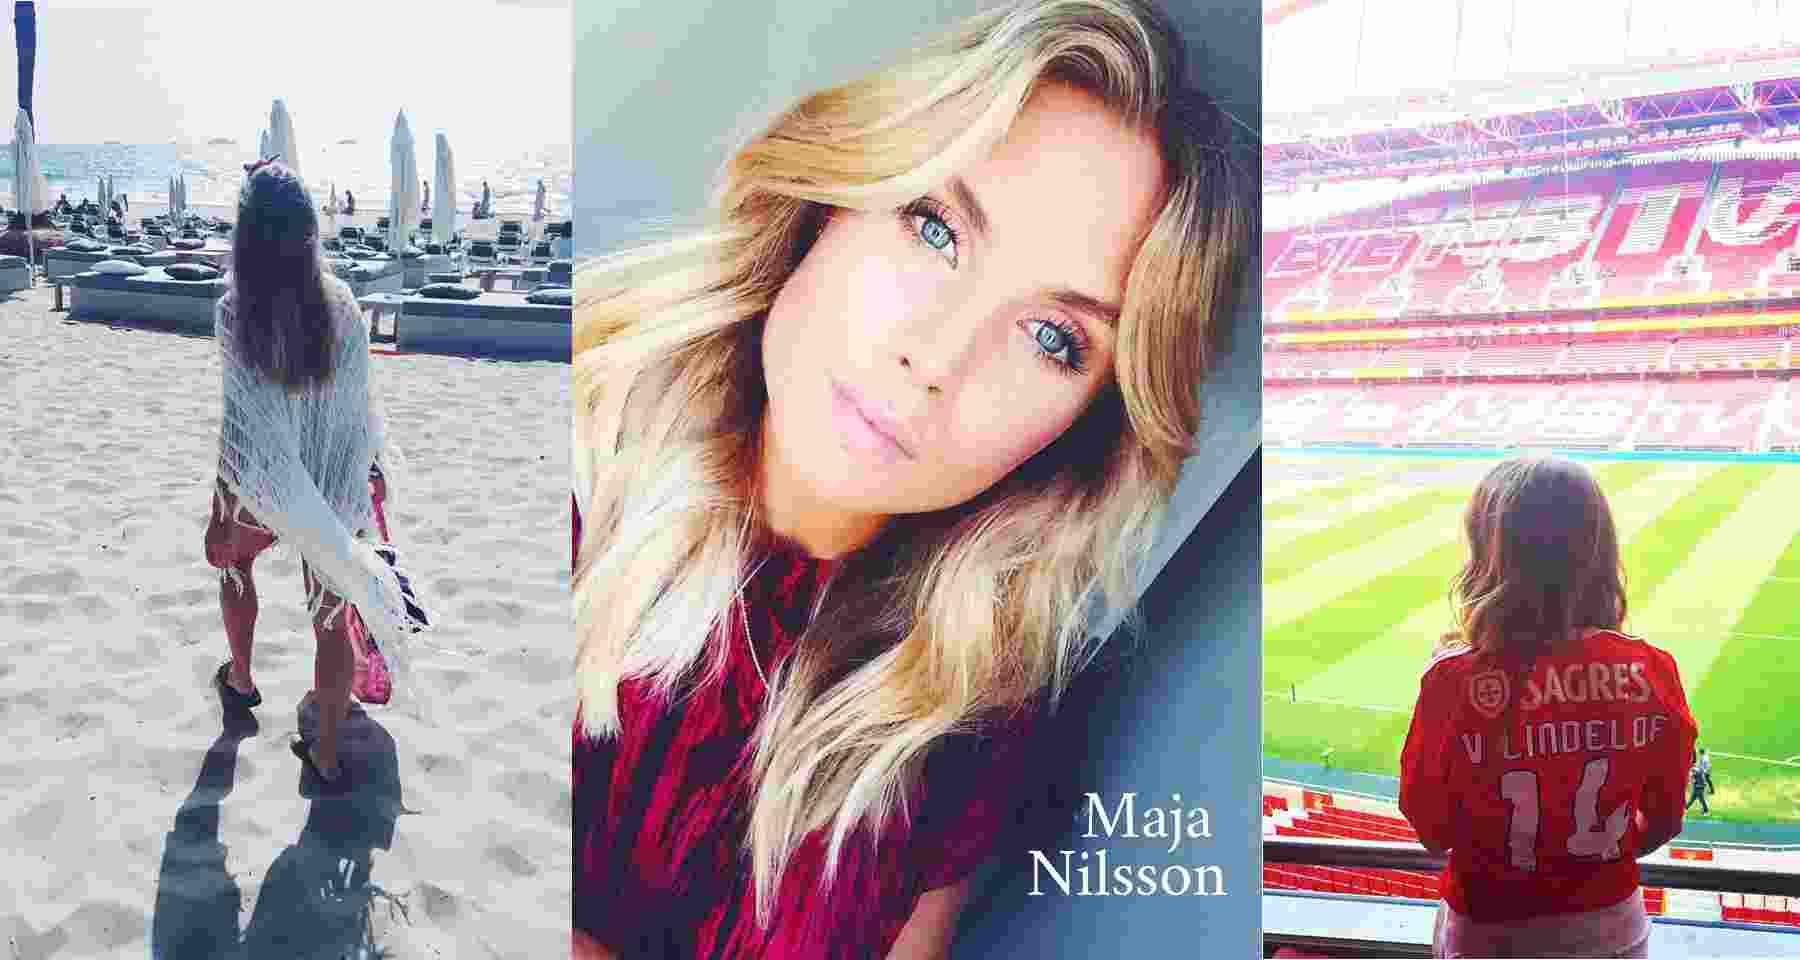 Maja Nilsson2